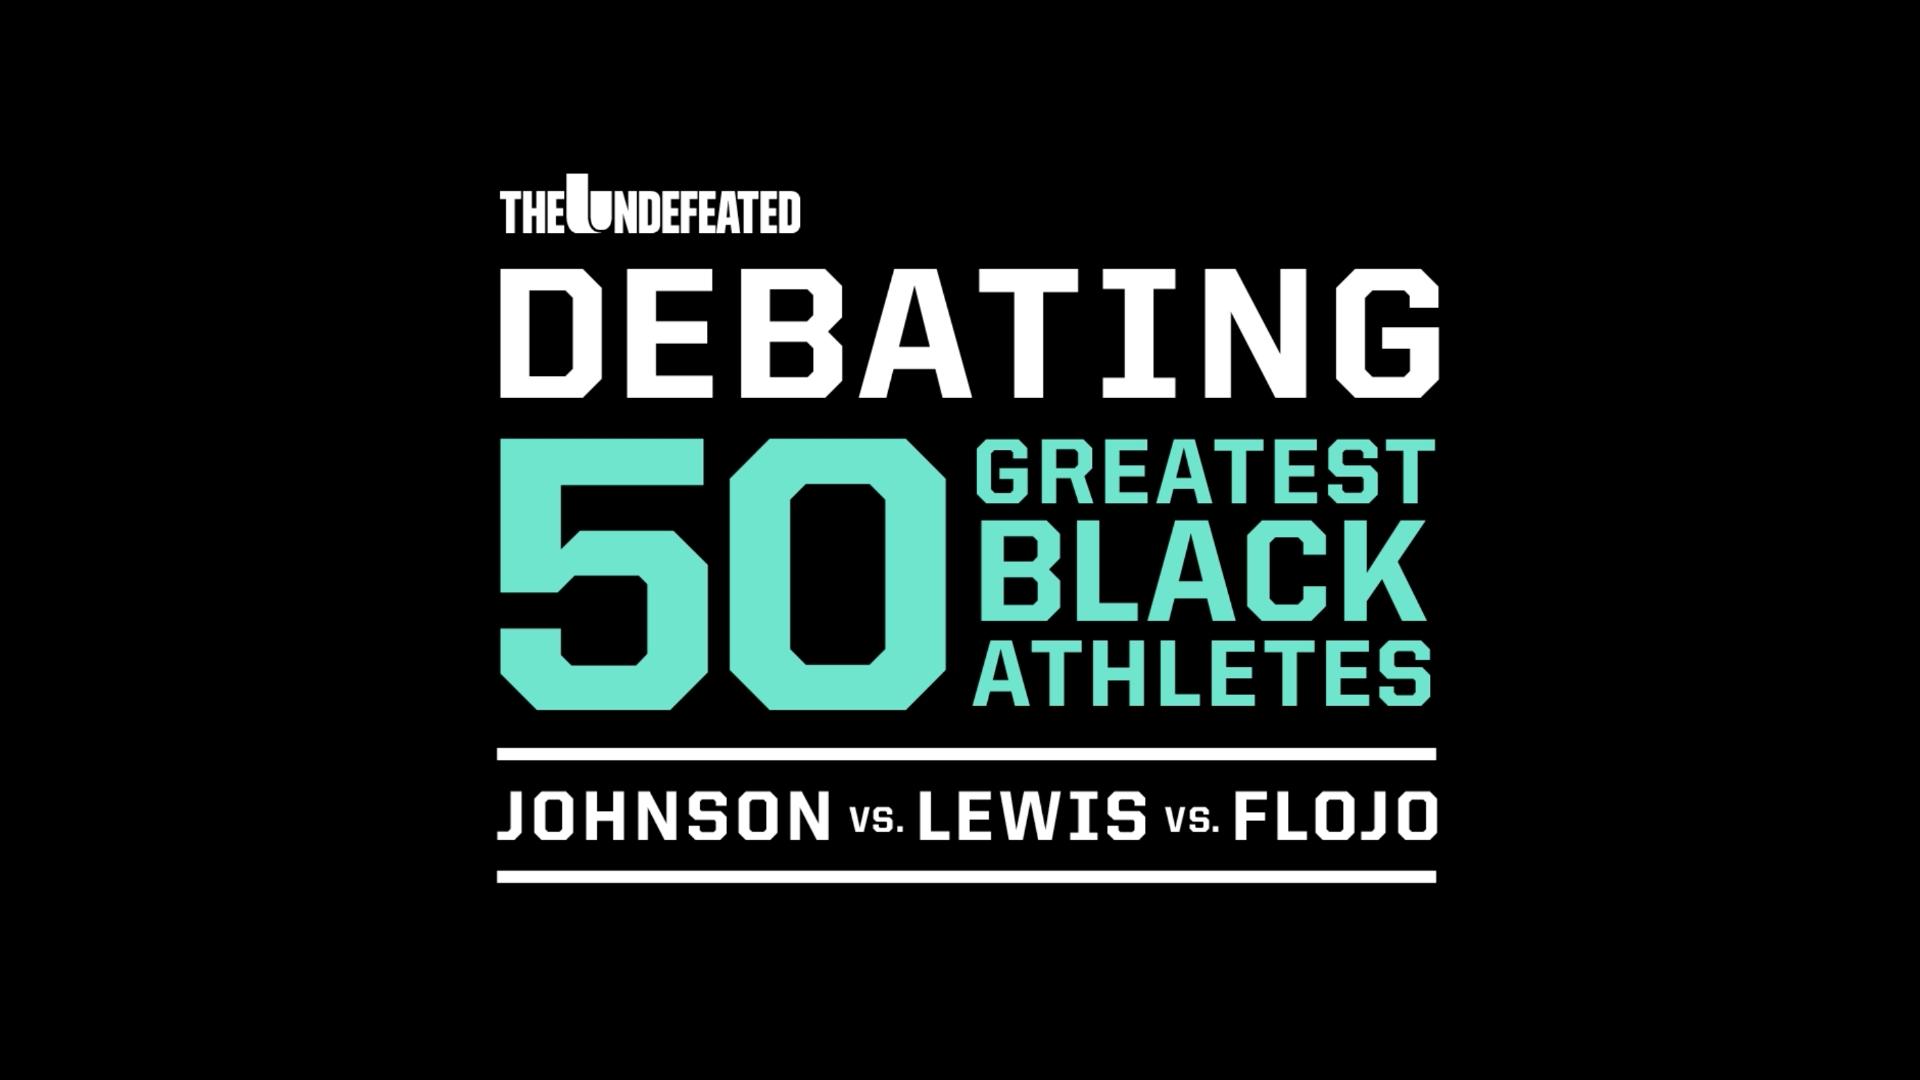 34dba59e 50 Greatest Black Athletes debate: Track and Field Stars